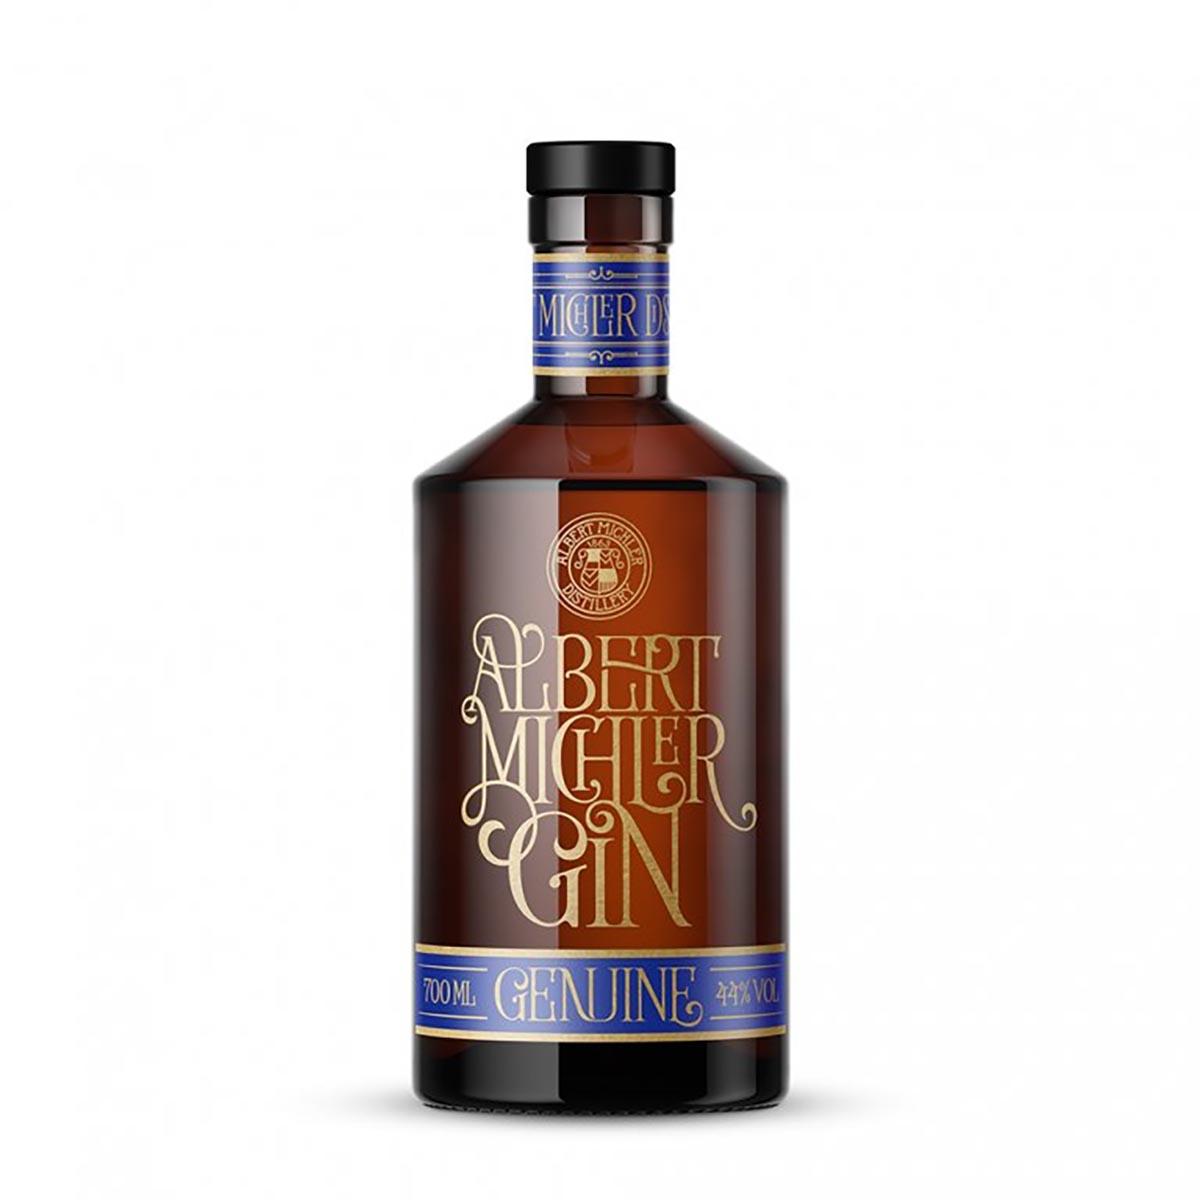 Albert Michler Gin Genuine